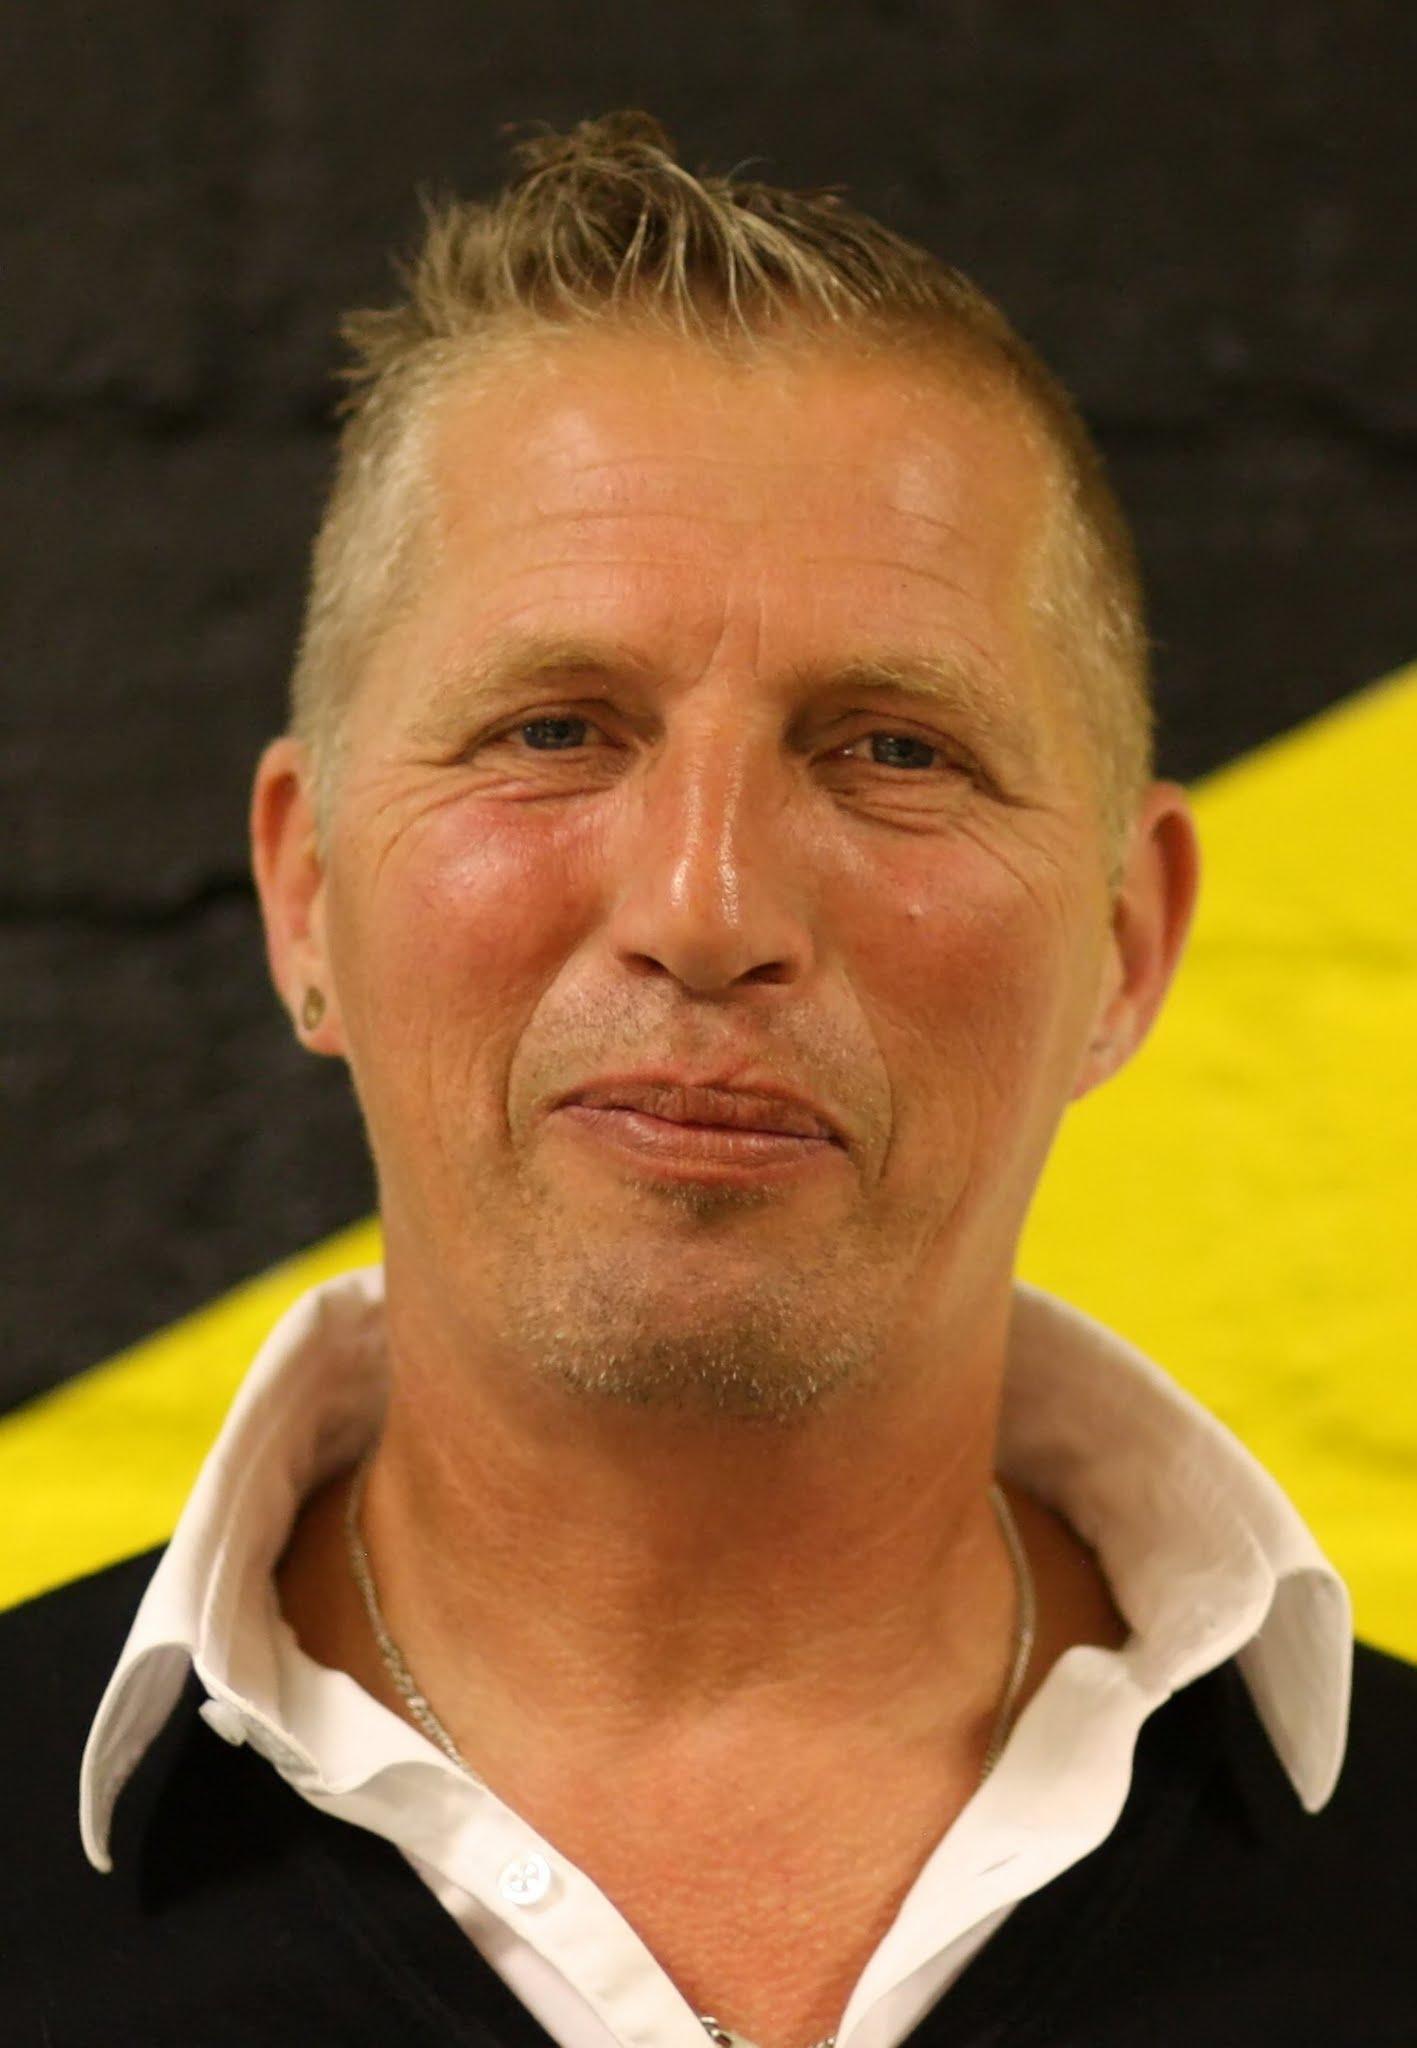 Gerrit Wenneker